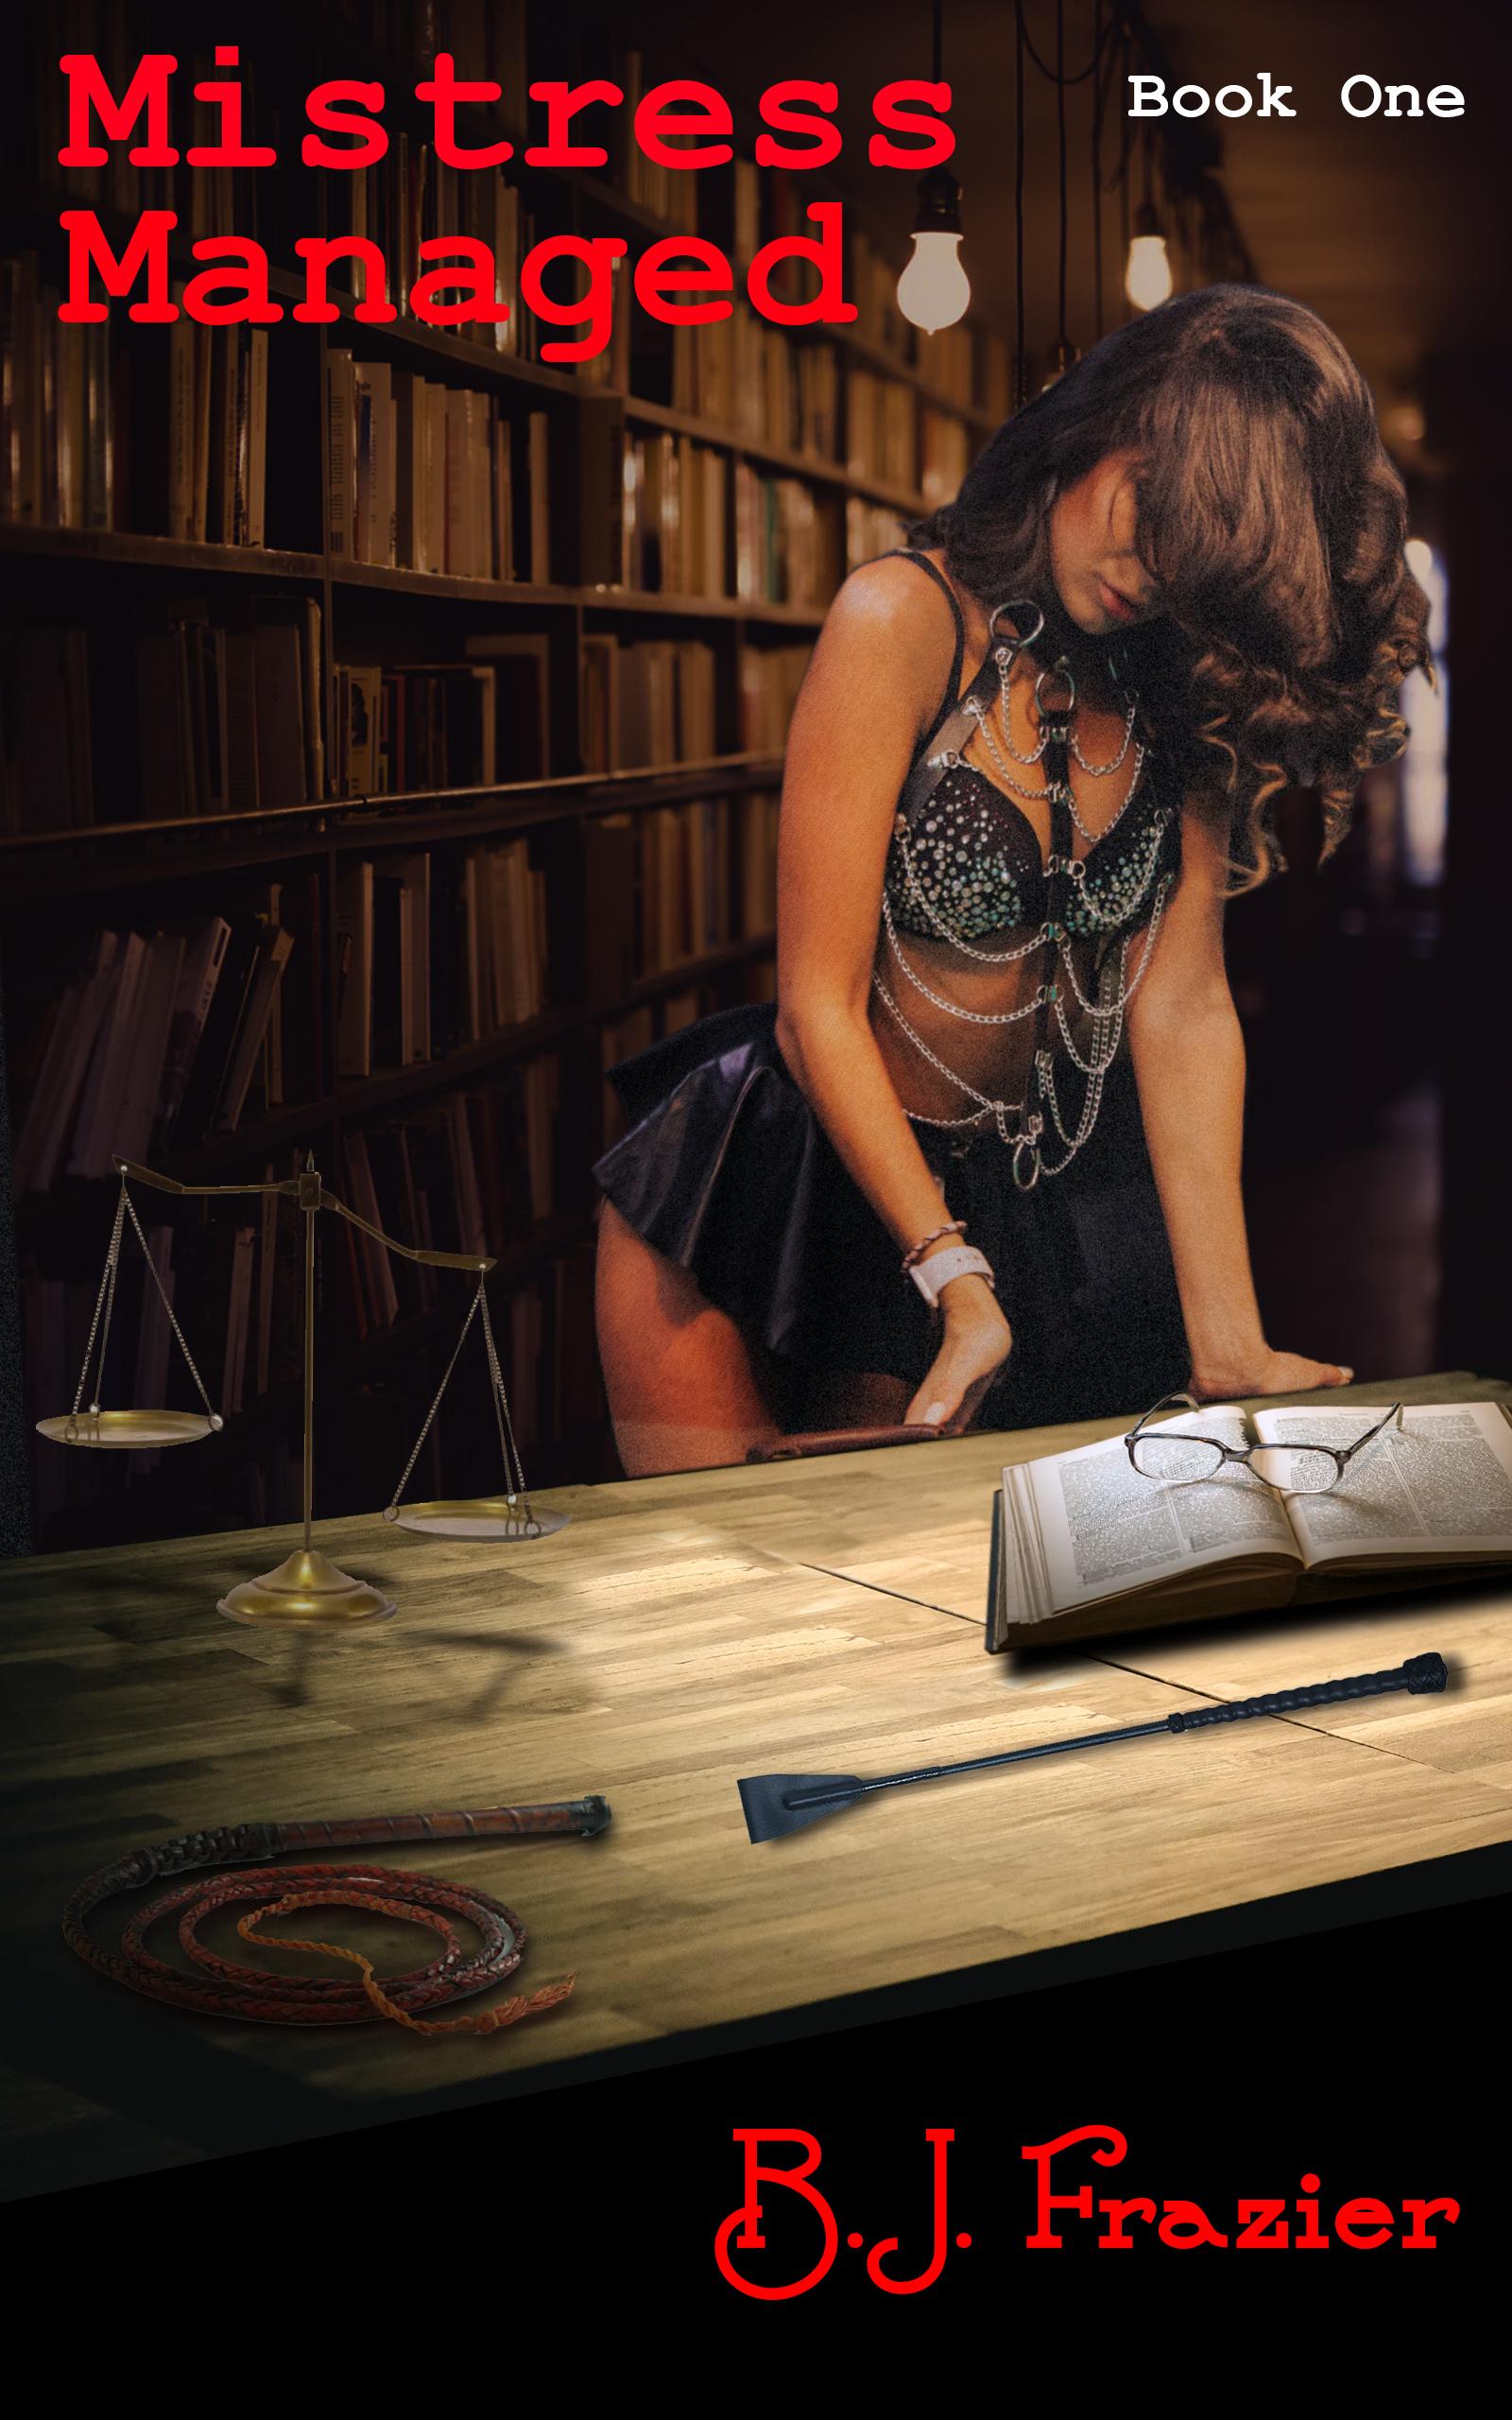 Mistress Managed - Book 1